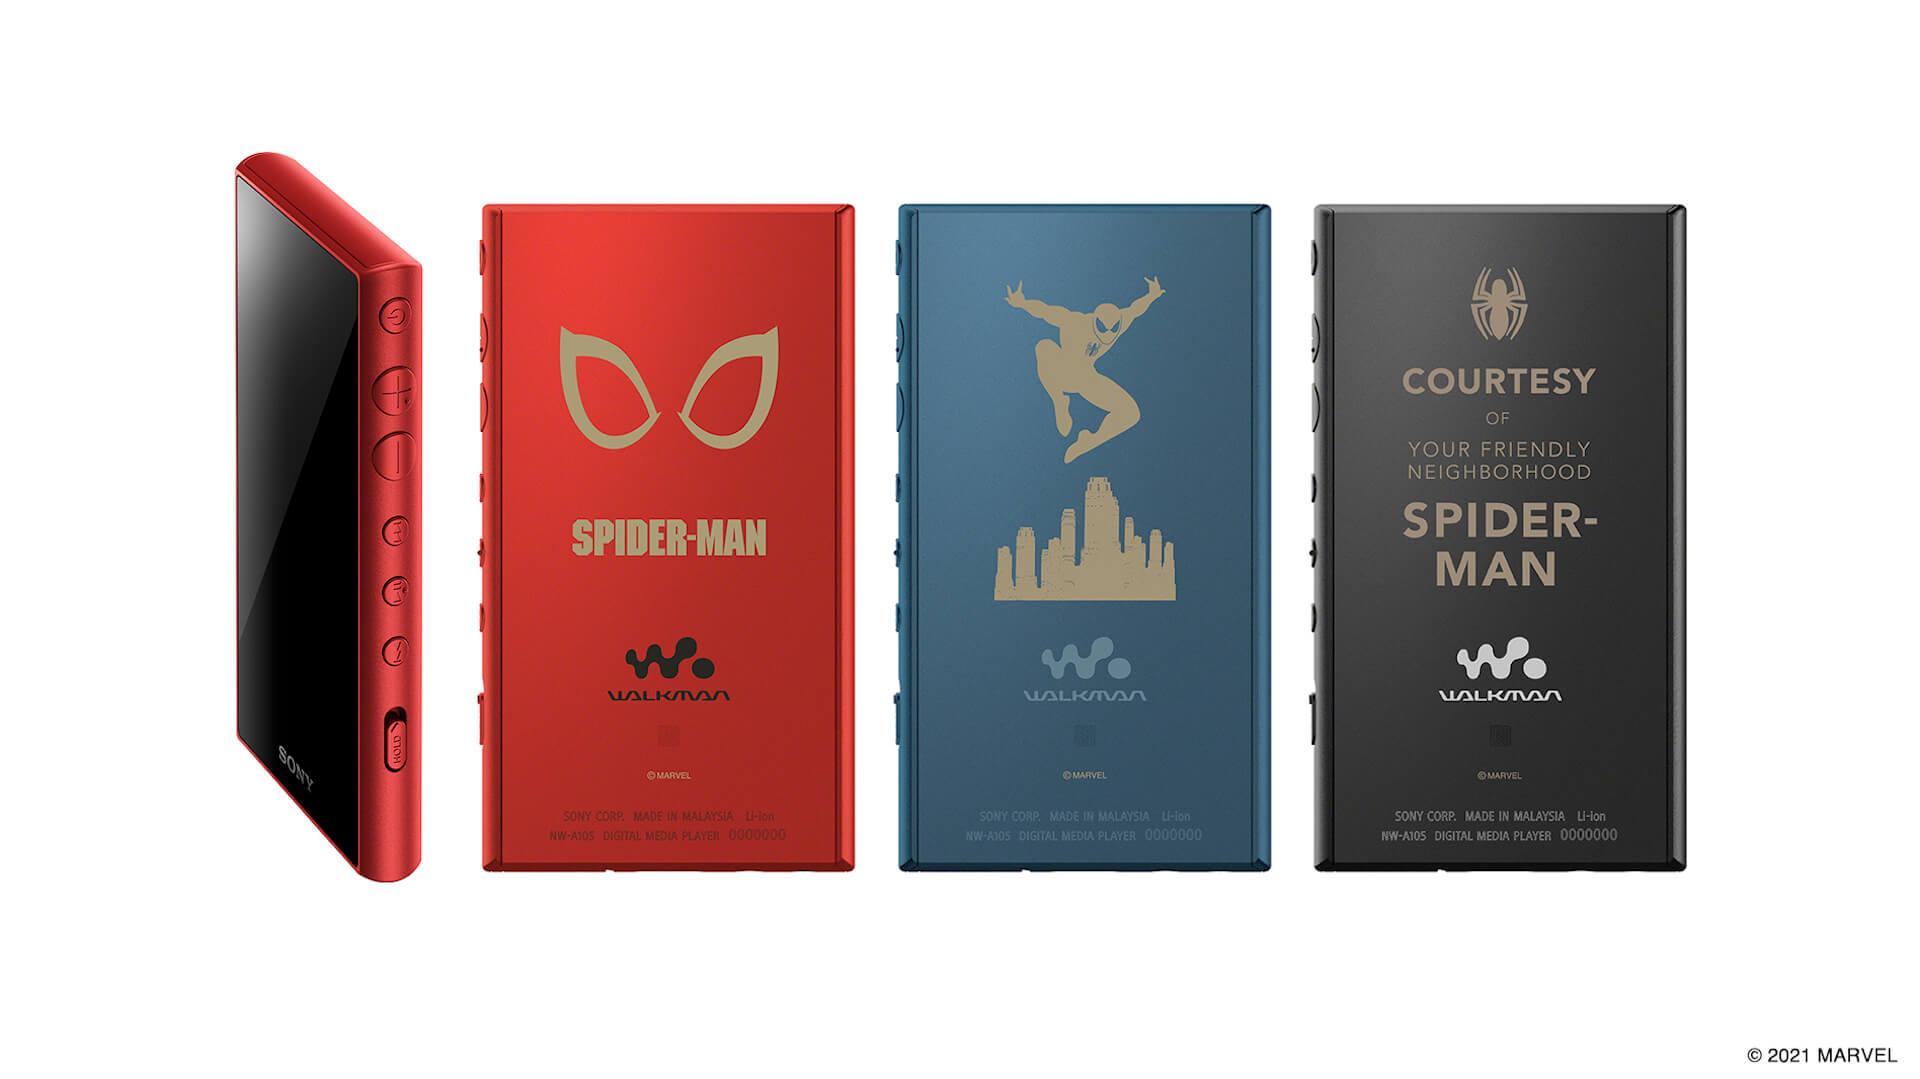 MARVELスパイダーマン仕様のソニーワイヤレスヘッドホン、ワイヤレススピーカー、ハイレゾ対応ウォークマンが発売決定!本日予約受付開始 tech211007_sony_spiderman_4